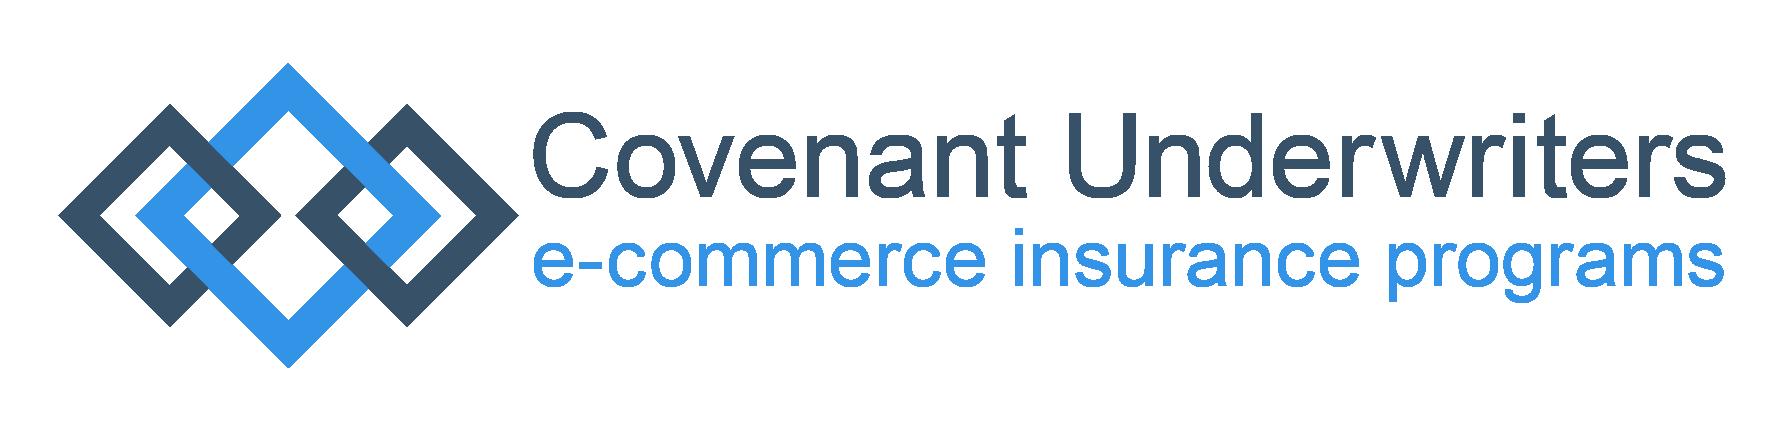 Covenant Underwriters